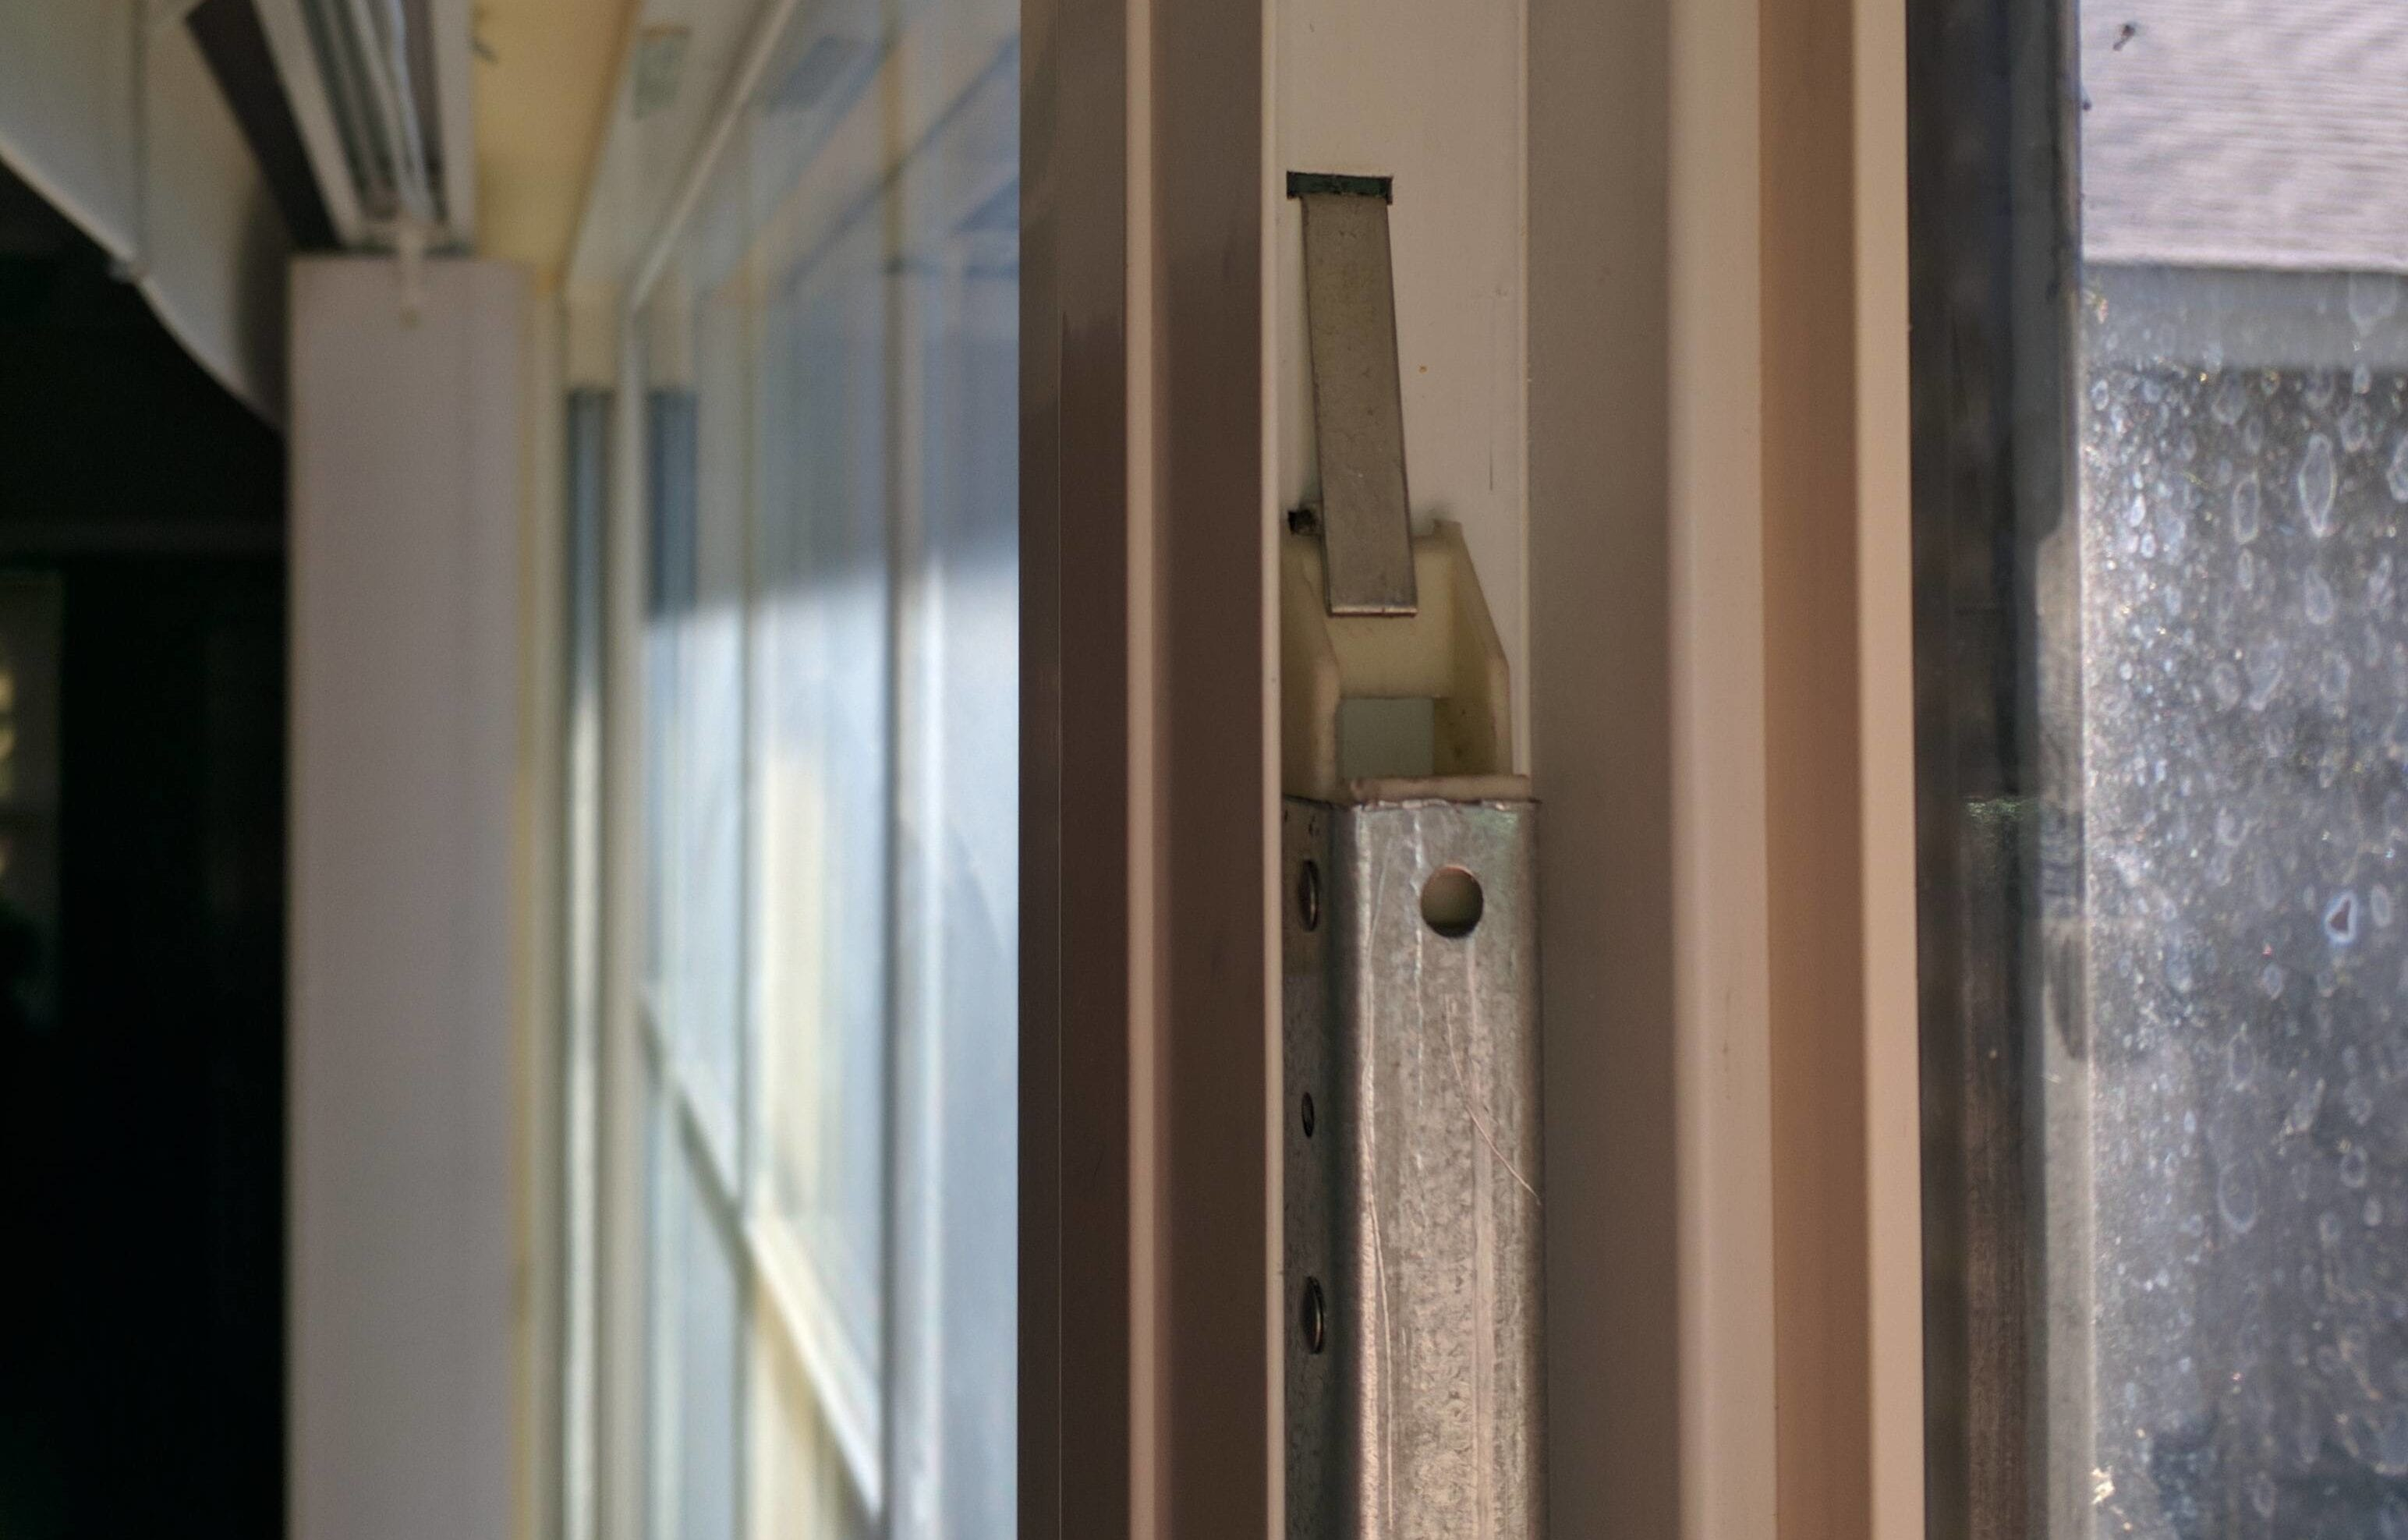 Window Hardware Repair Melbourne FL